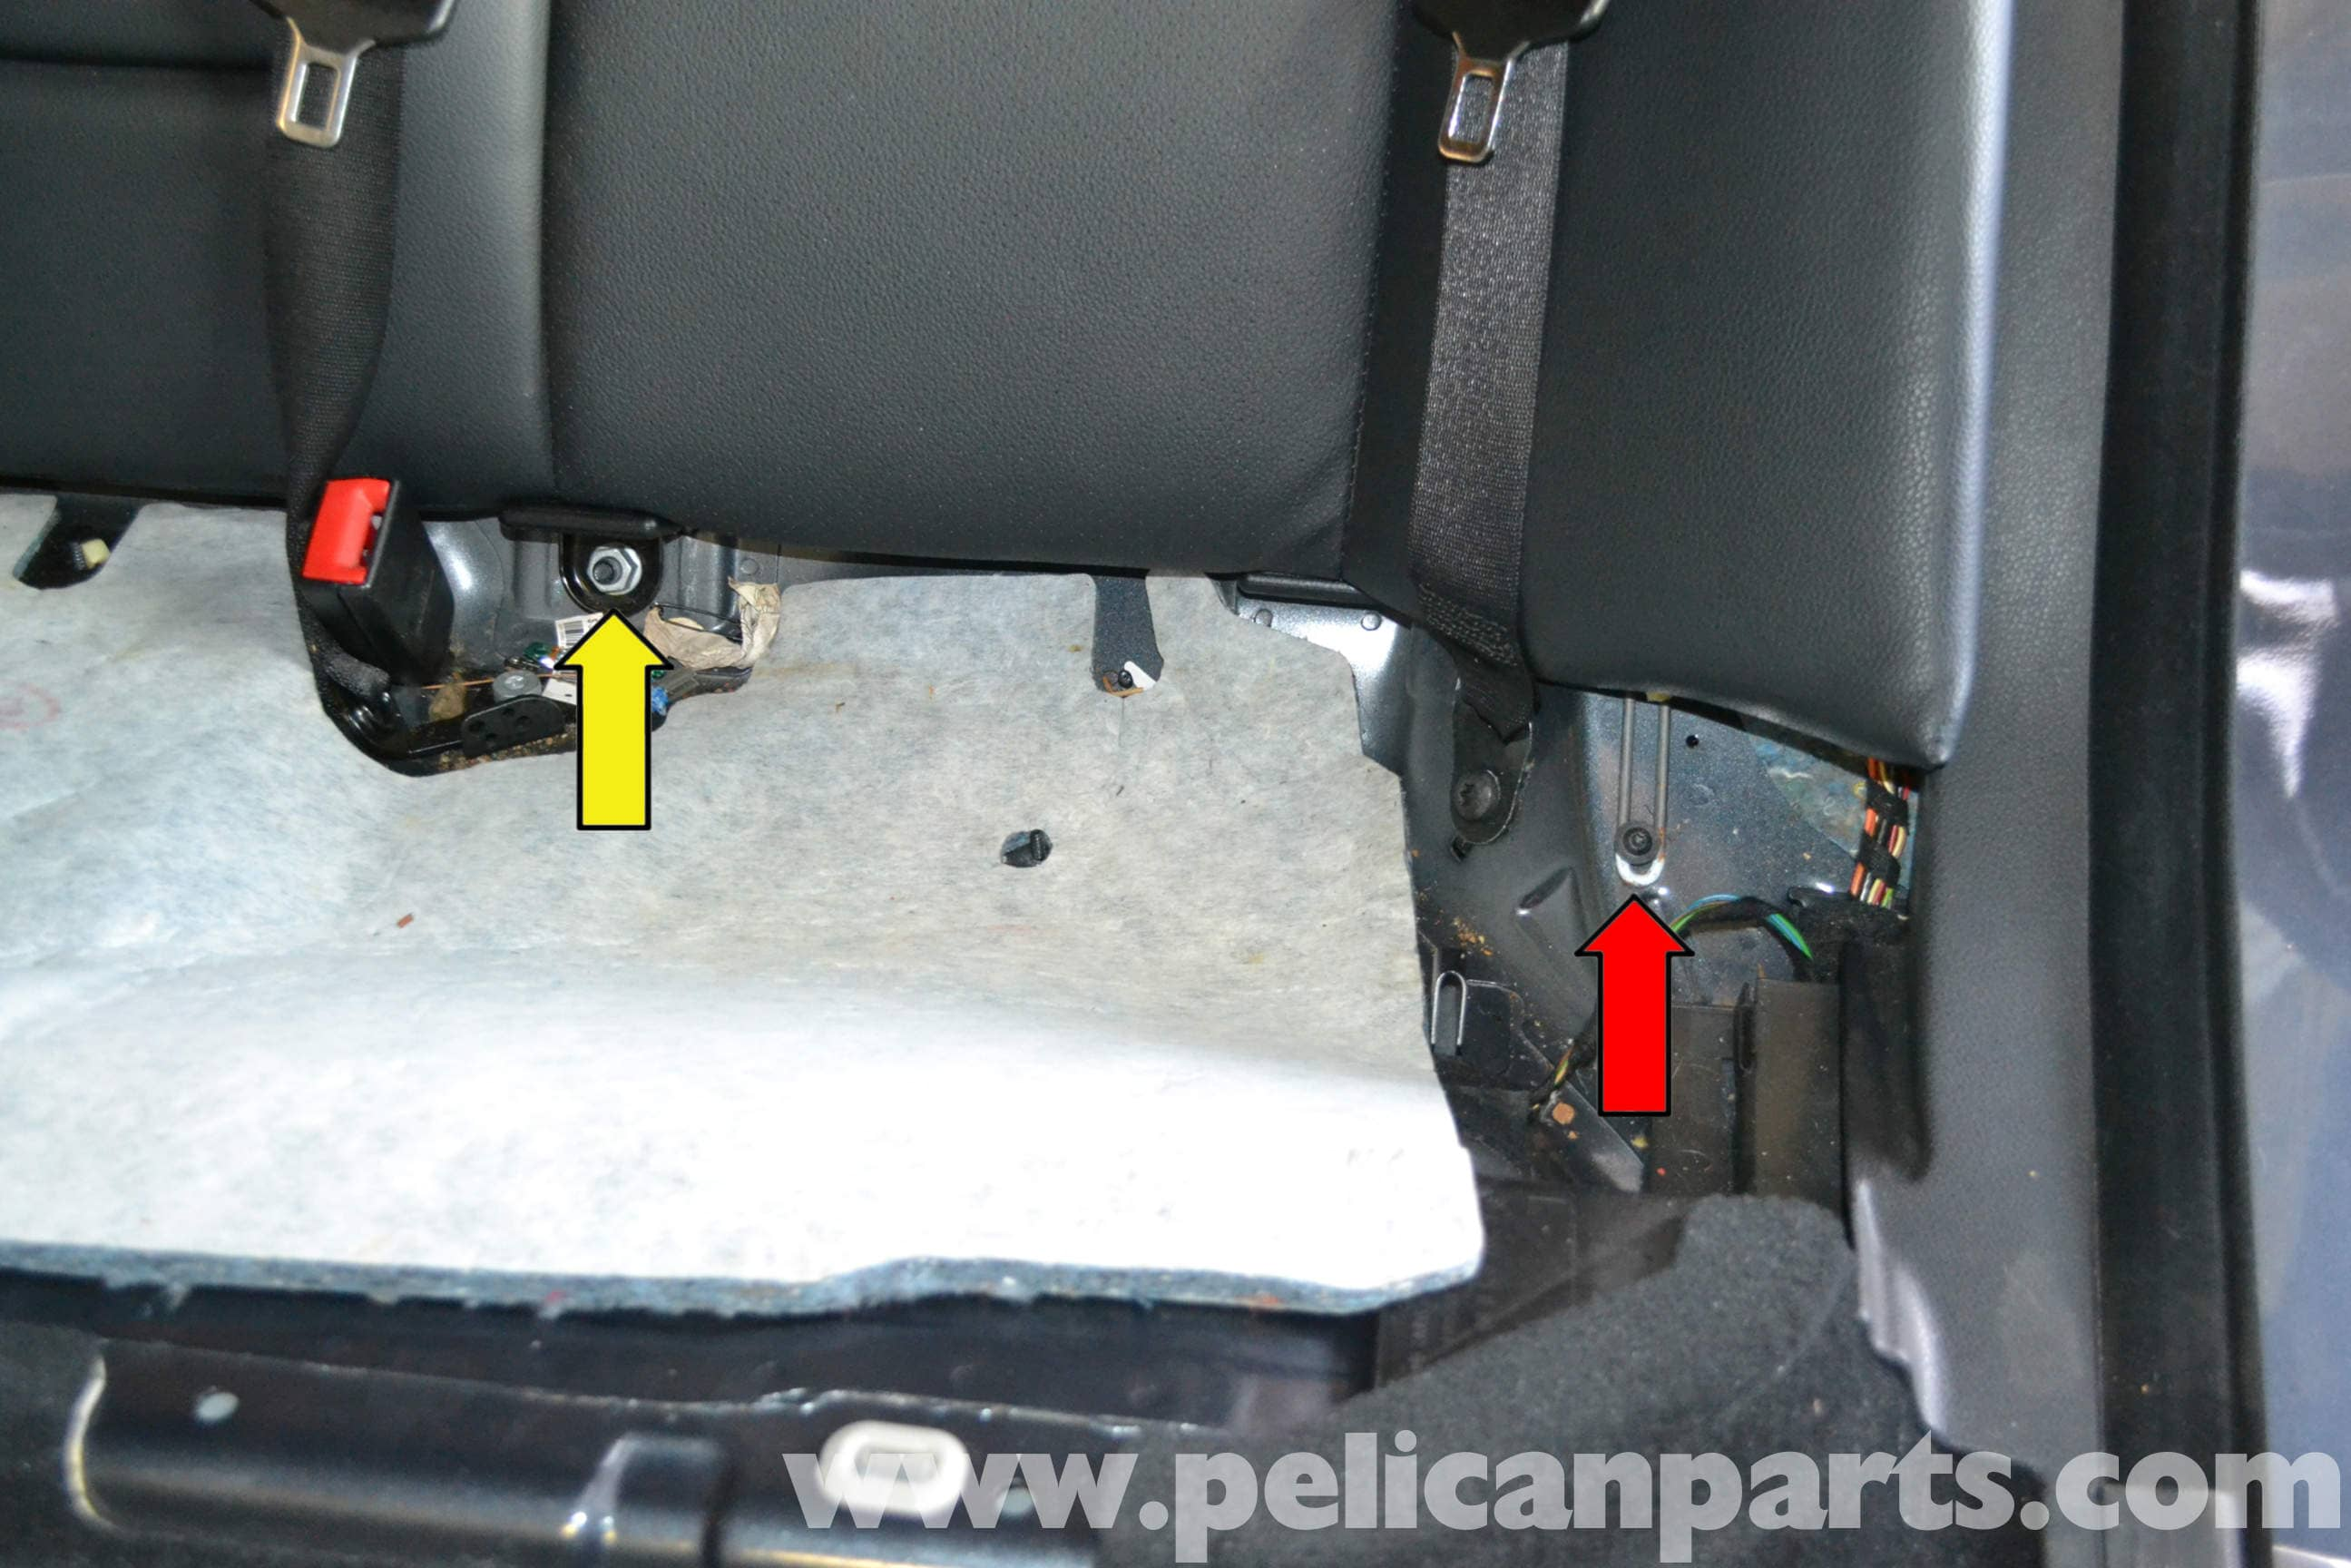 Mercedes-Benz E-Class: Folding the rear seat backrest back